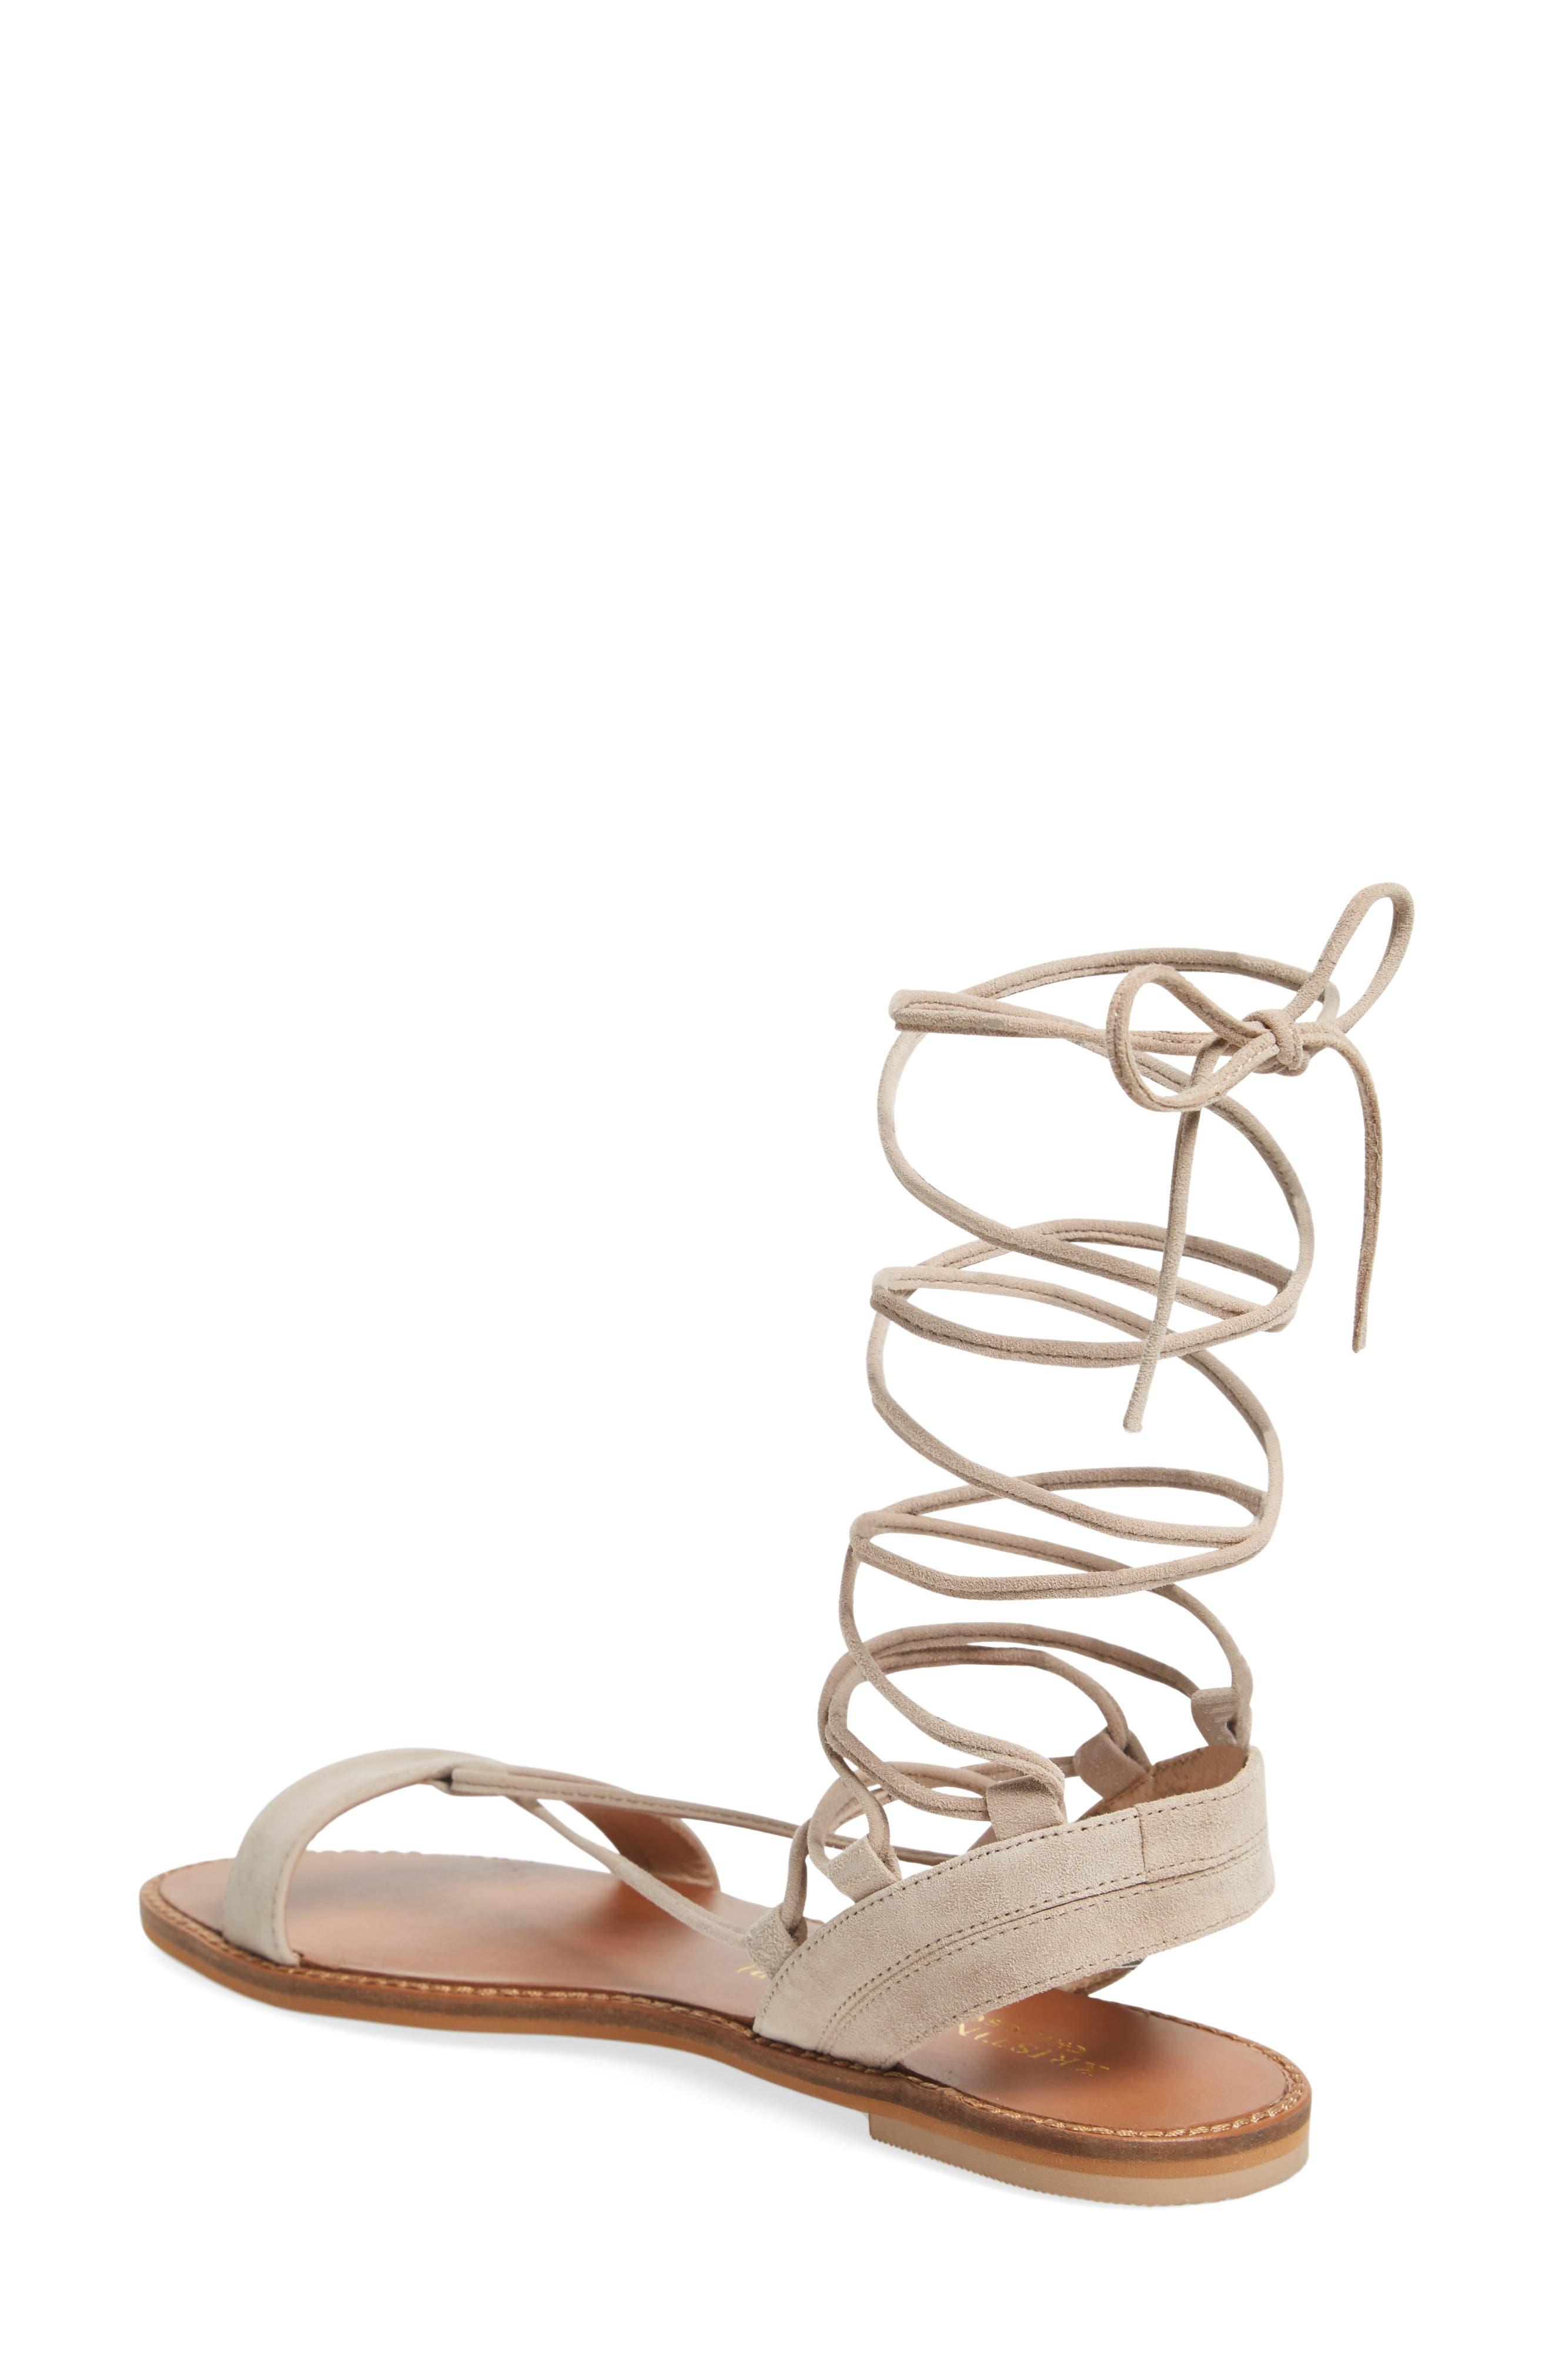 Brea Ankle Wrap Sandal,                             Alternate thumbnail 4, color,